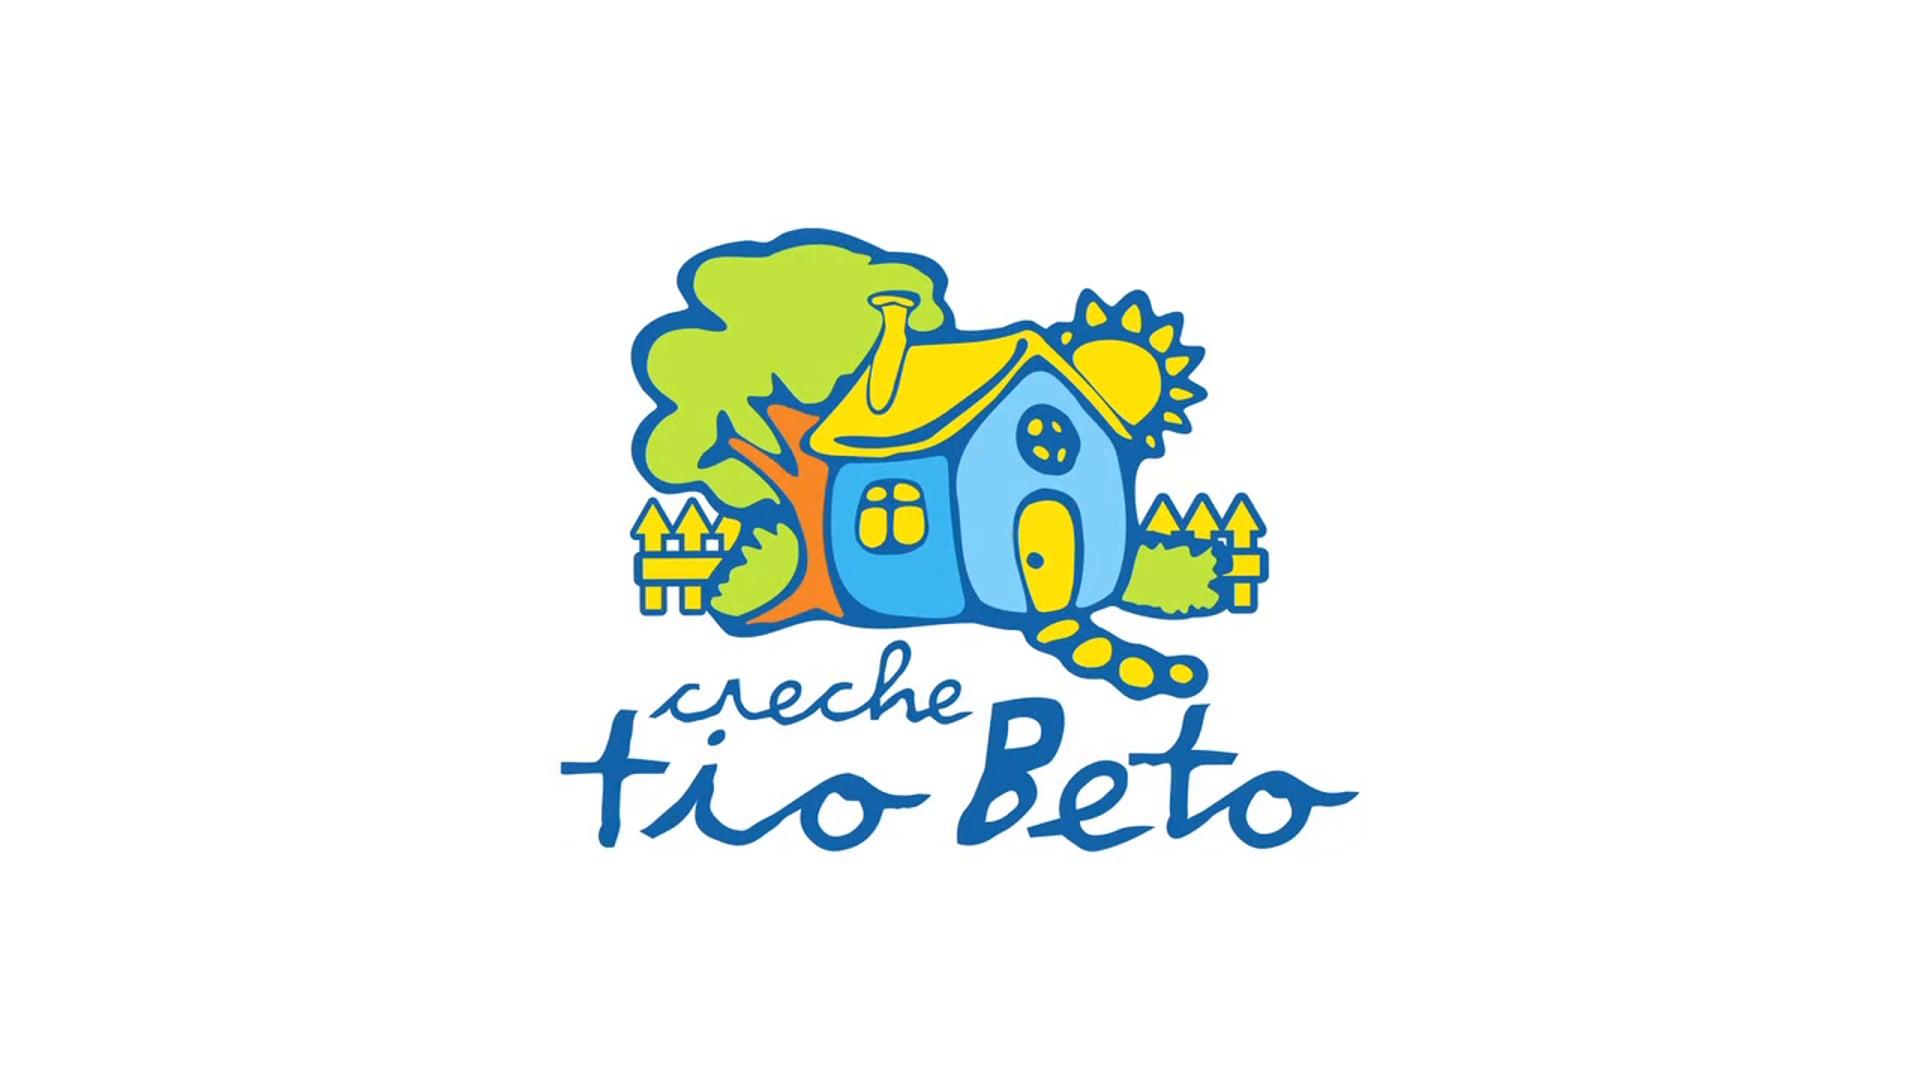 Institucional - Creche Tio Beto